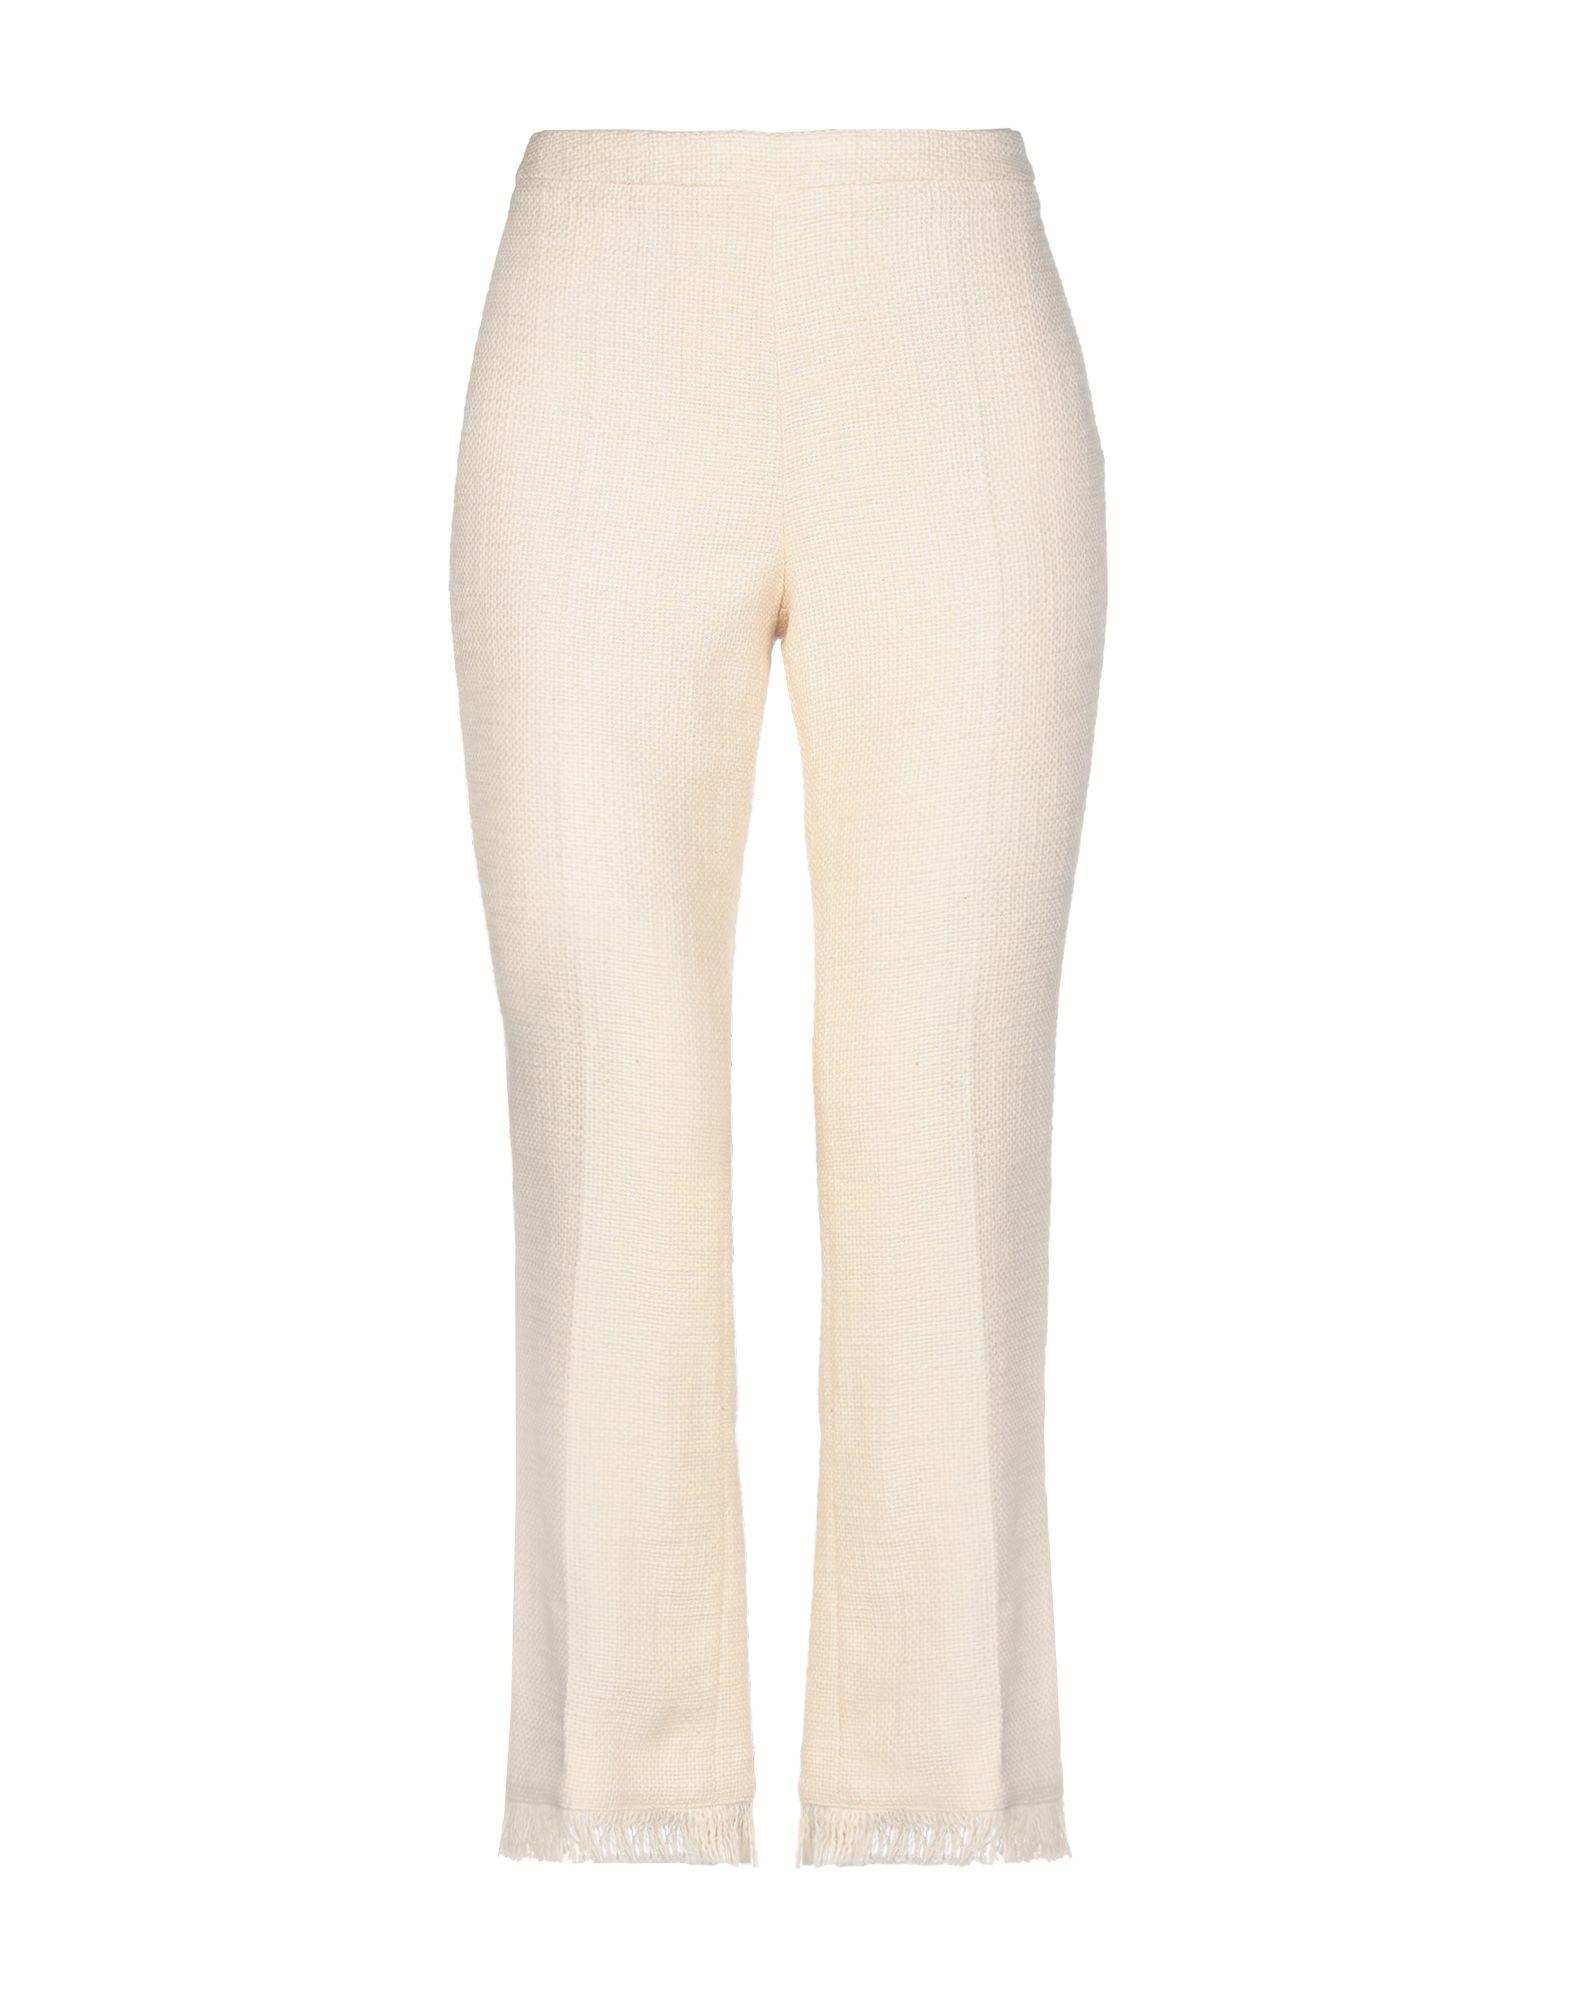 Pantalone Compagnia Italiana damen - 13270550EJ